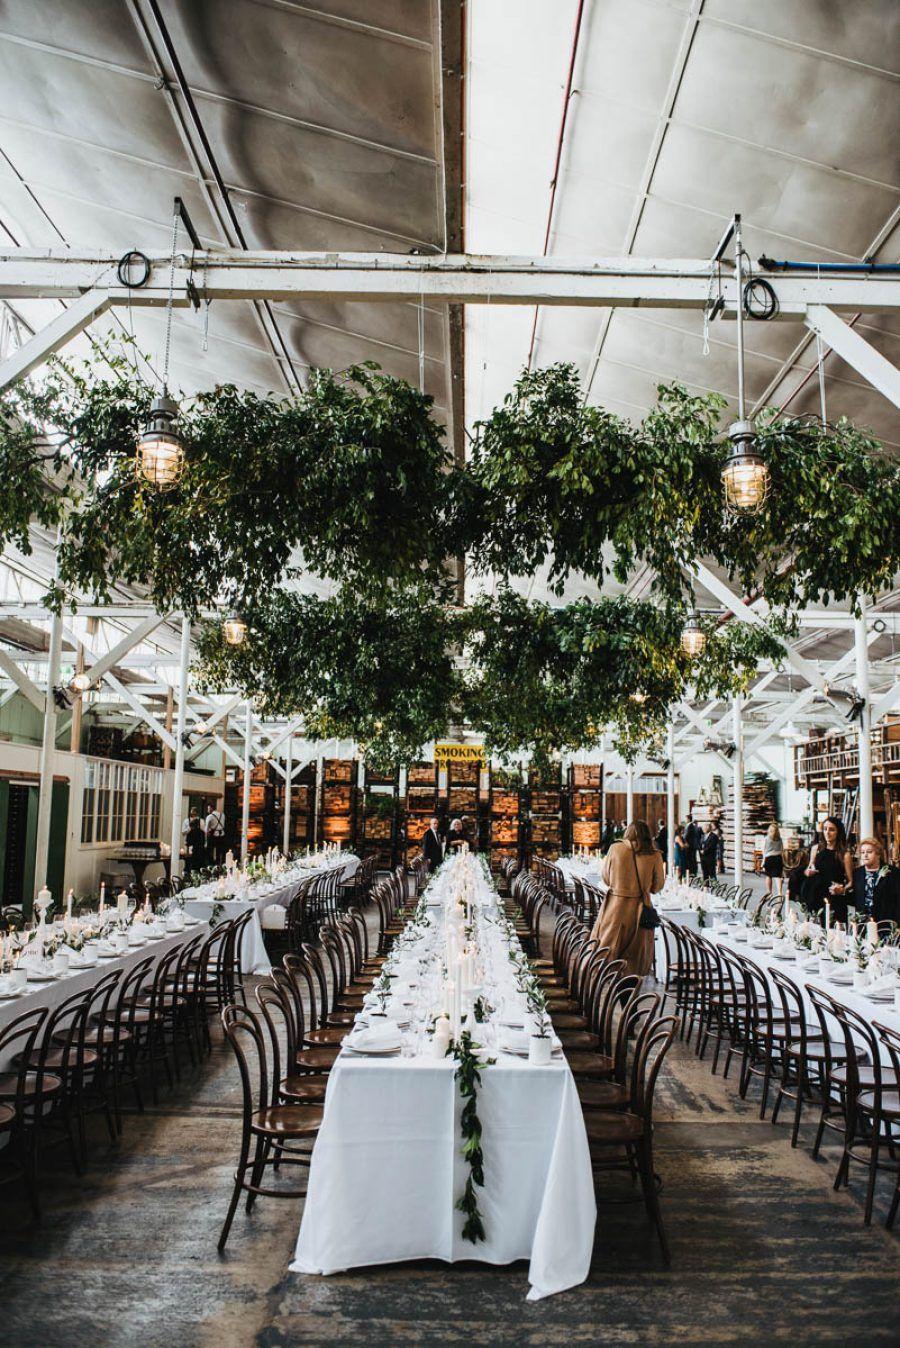 Modern Warehouse Wedding With Hanging Greenery Creative